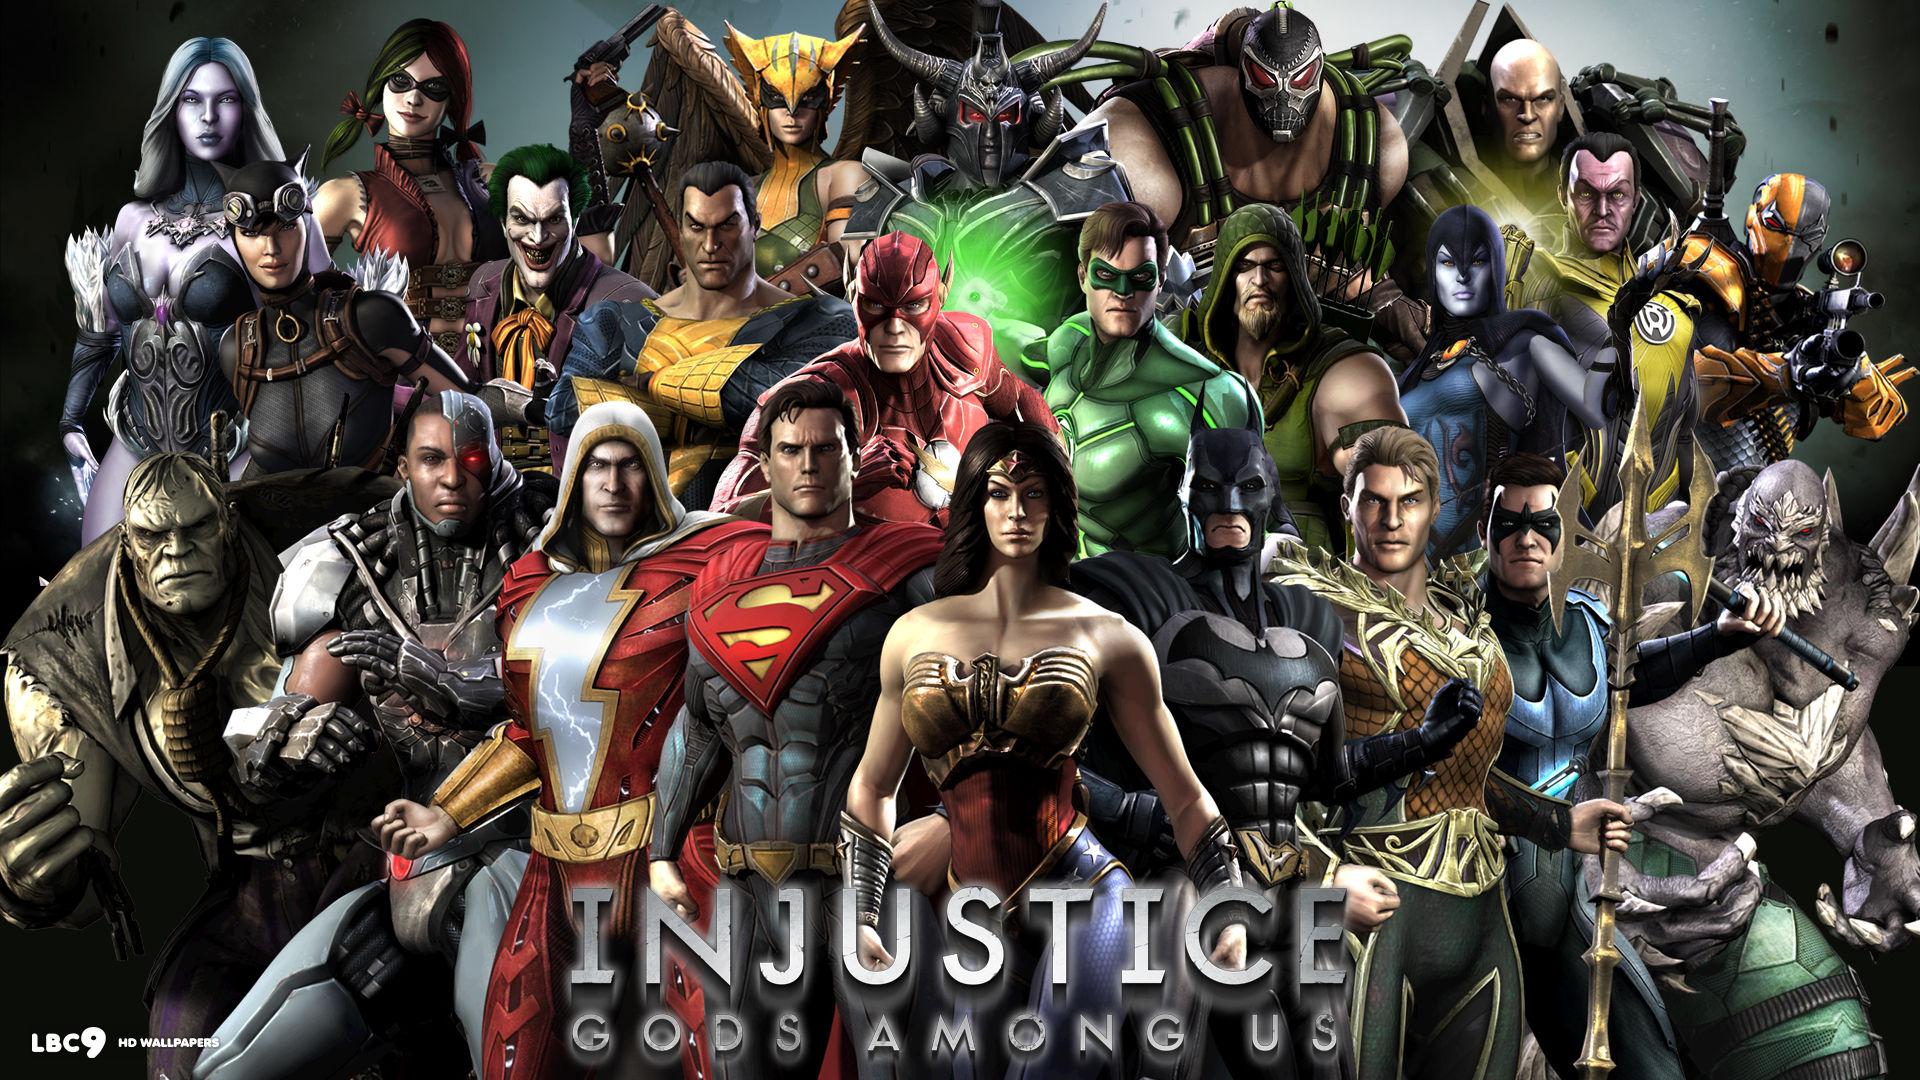 injustice.gods among us.ultimate edition патч